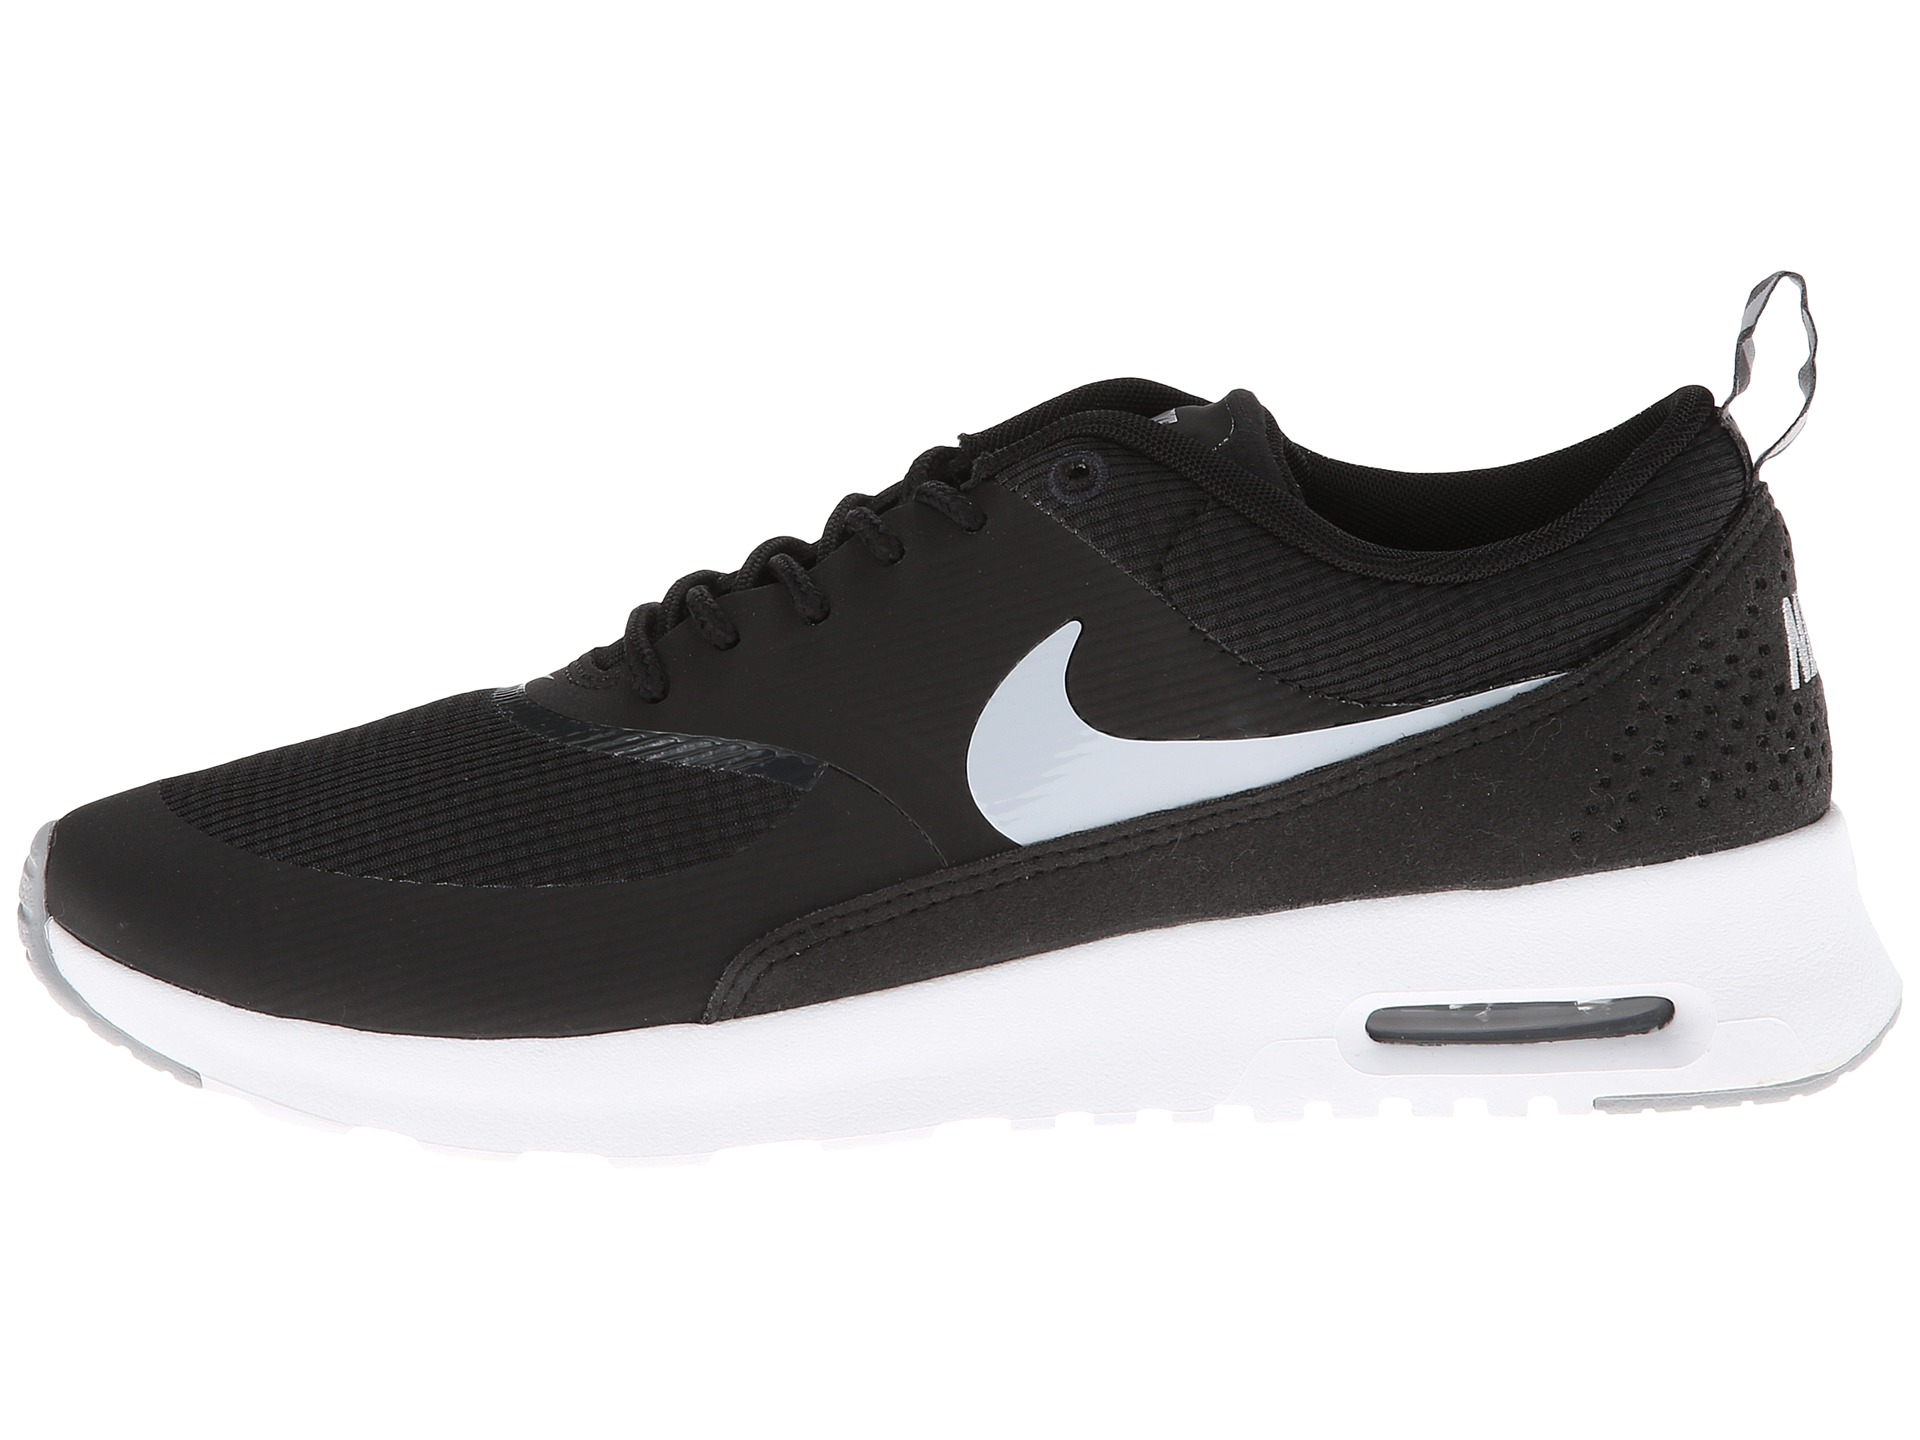 reebok classic black - Nike Air Max Thea - 6pm.com